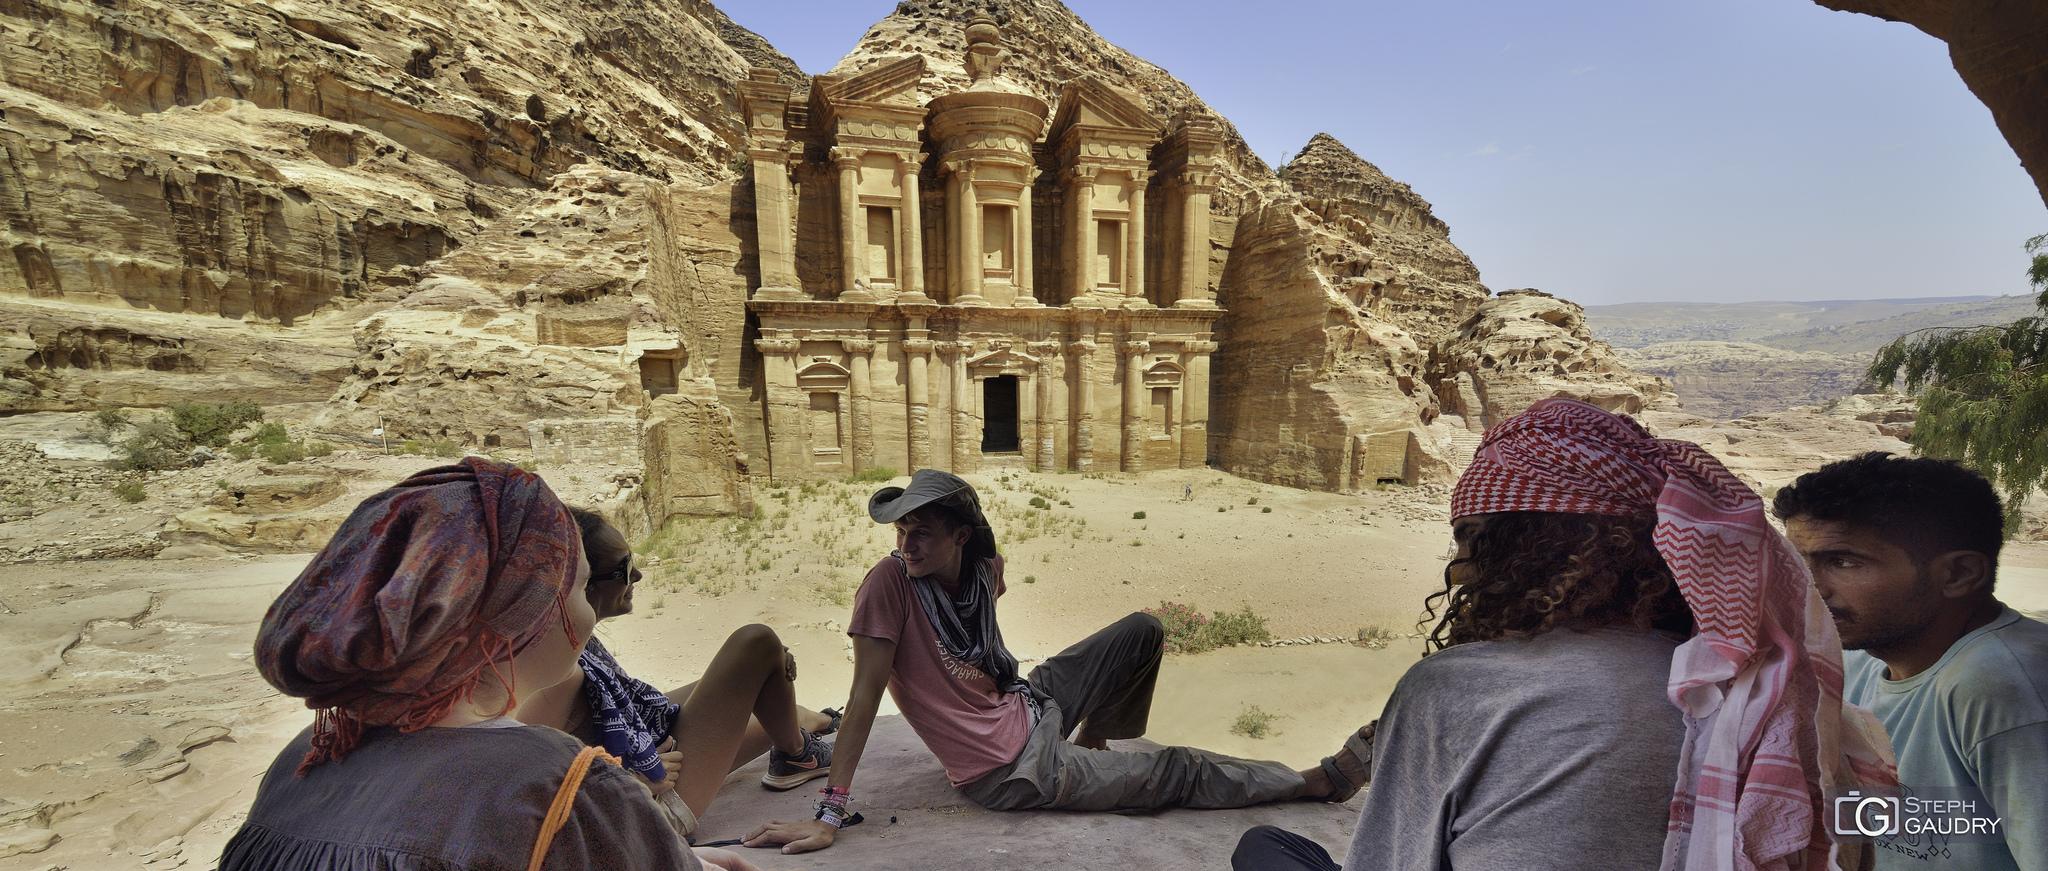 al-Deir - le monastère de Petra [Click to start slideshow]